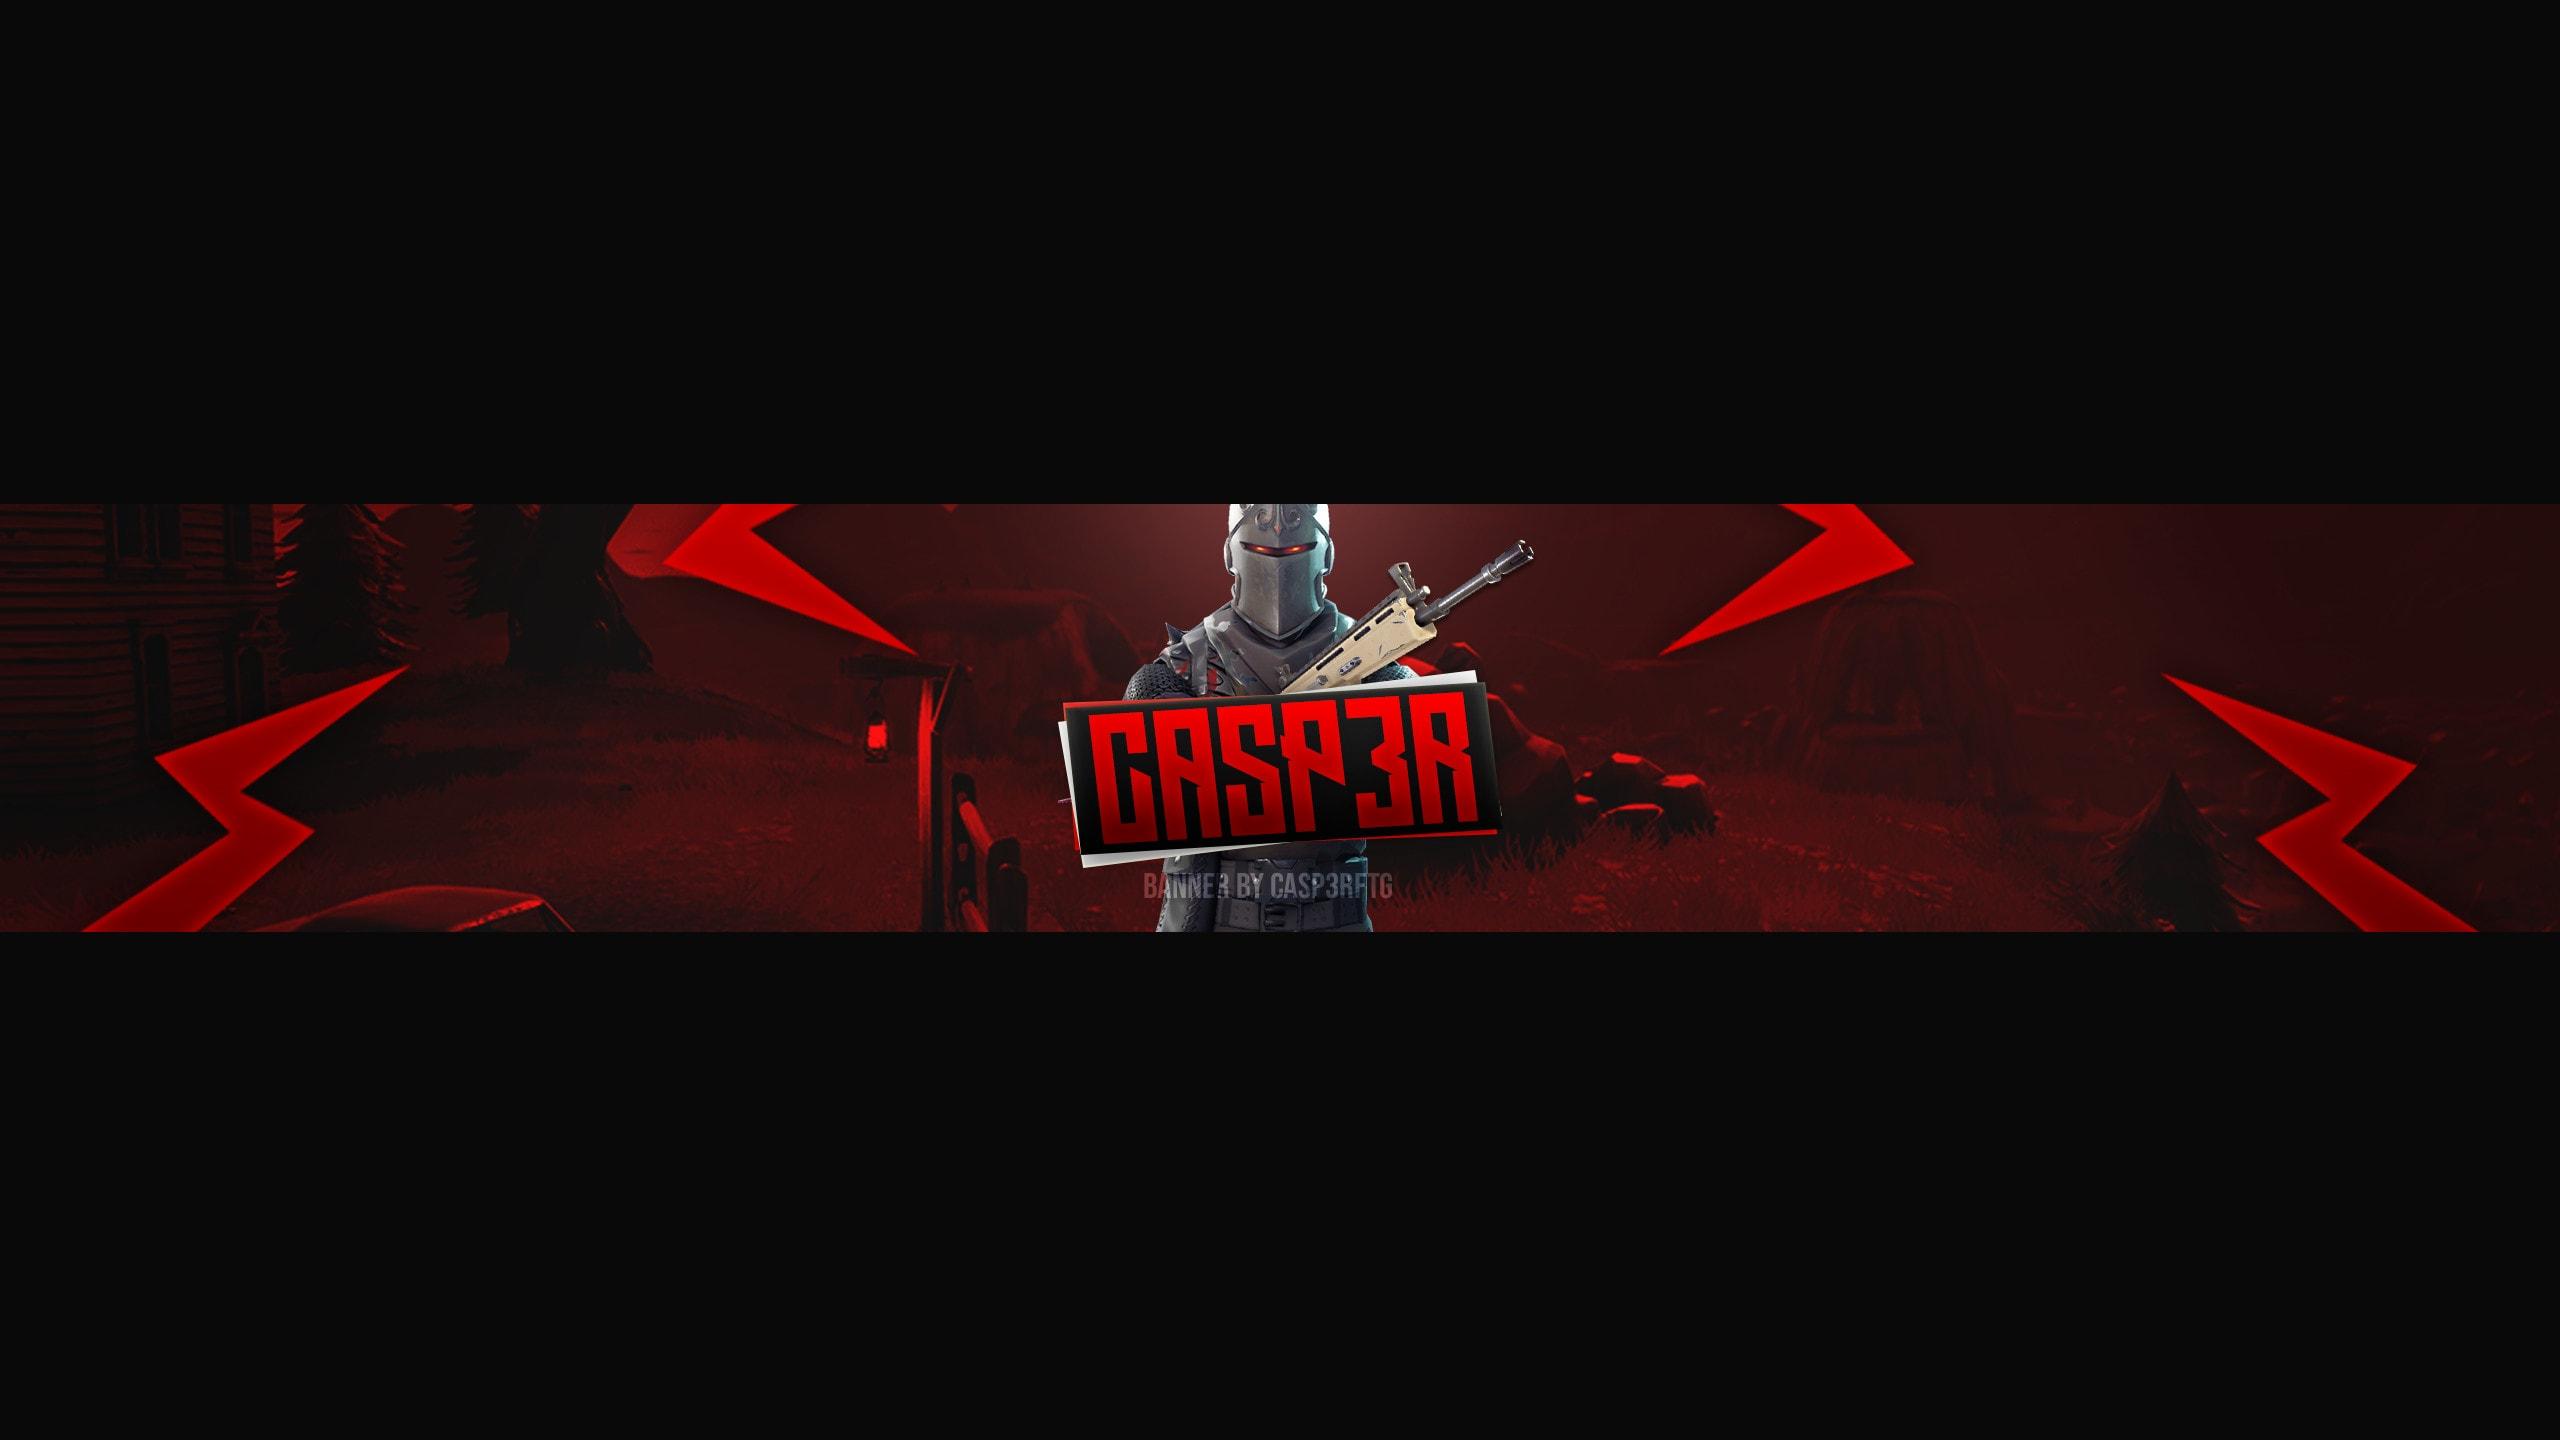 Fortnite Gaming Youtube Banner By Casp3rftg